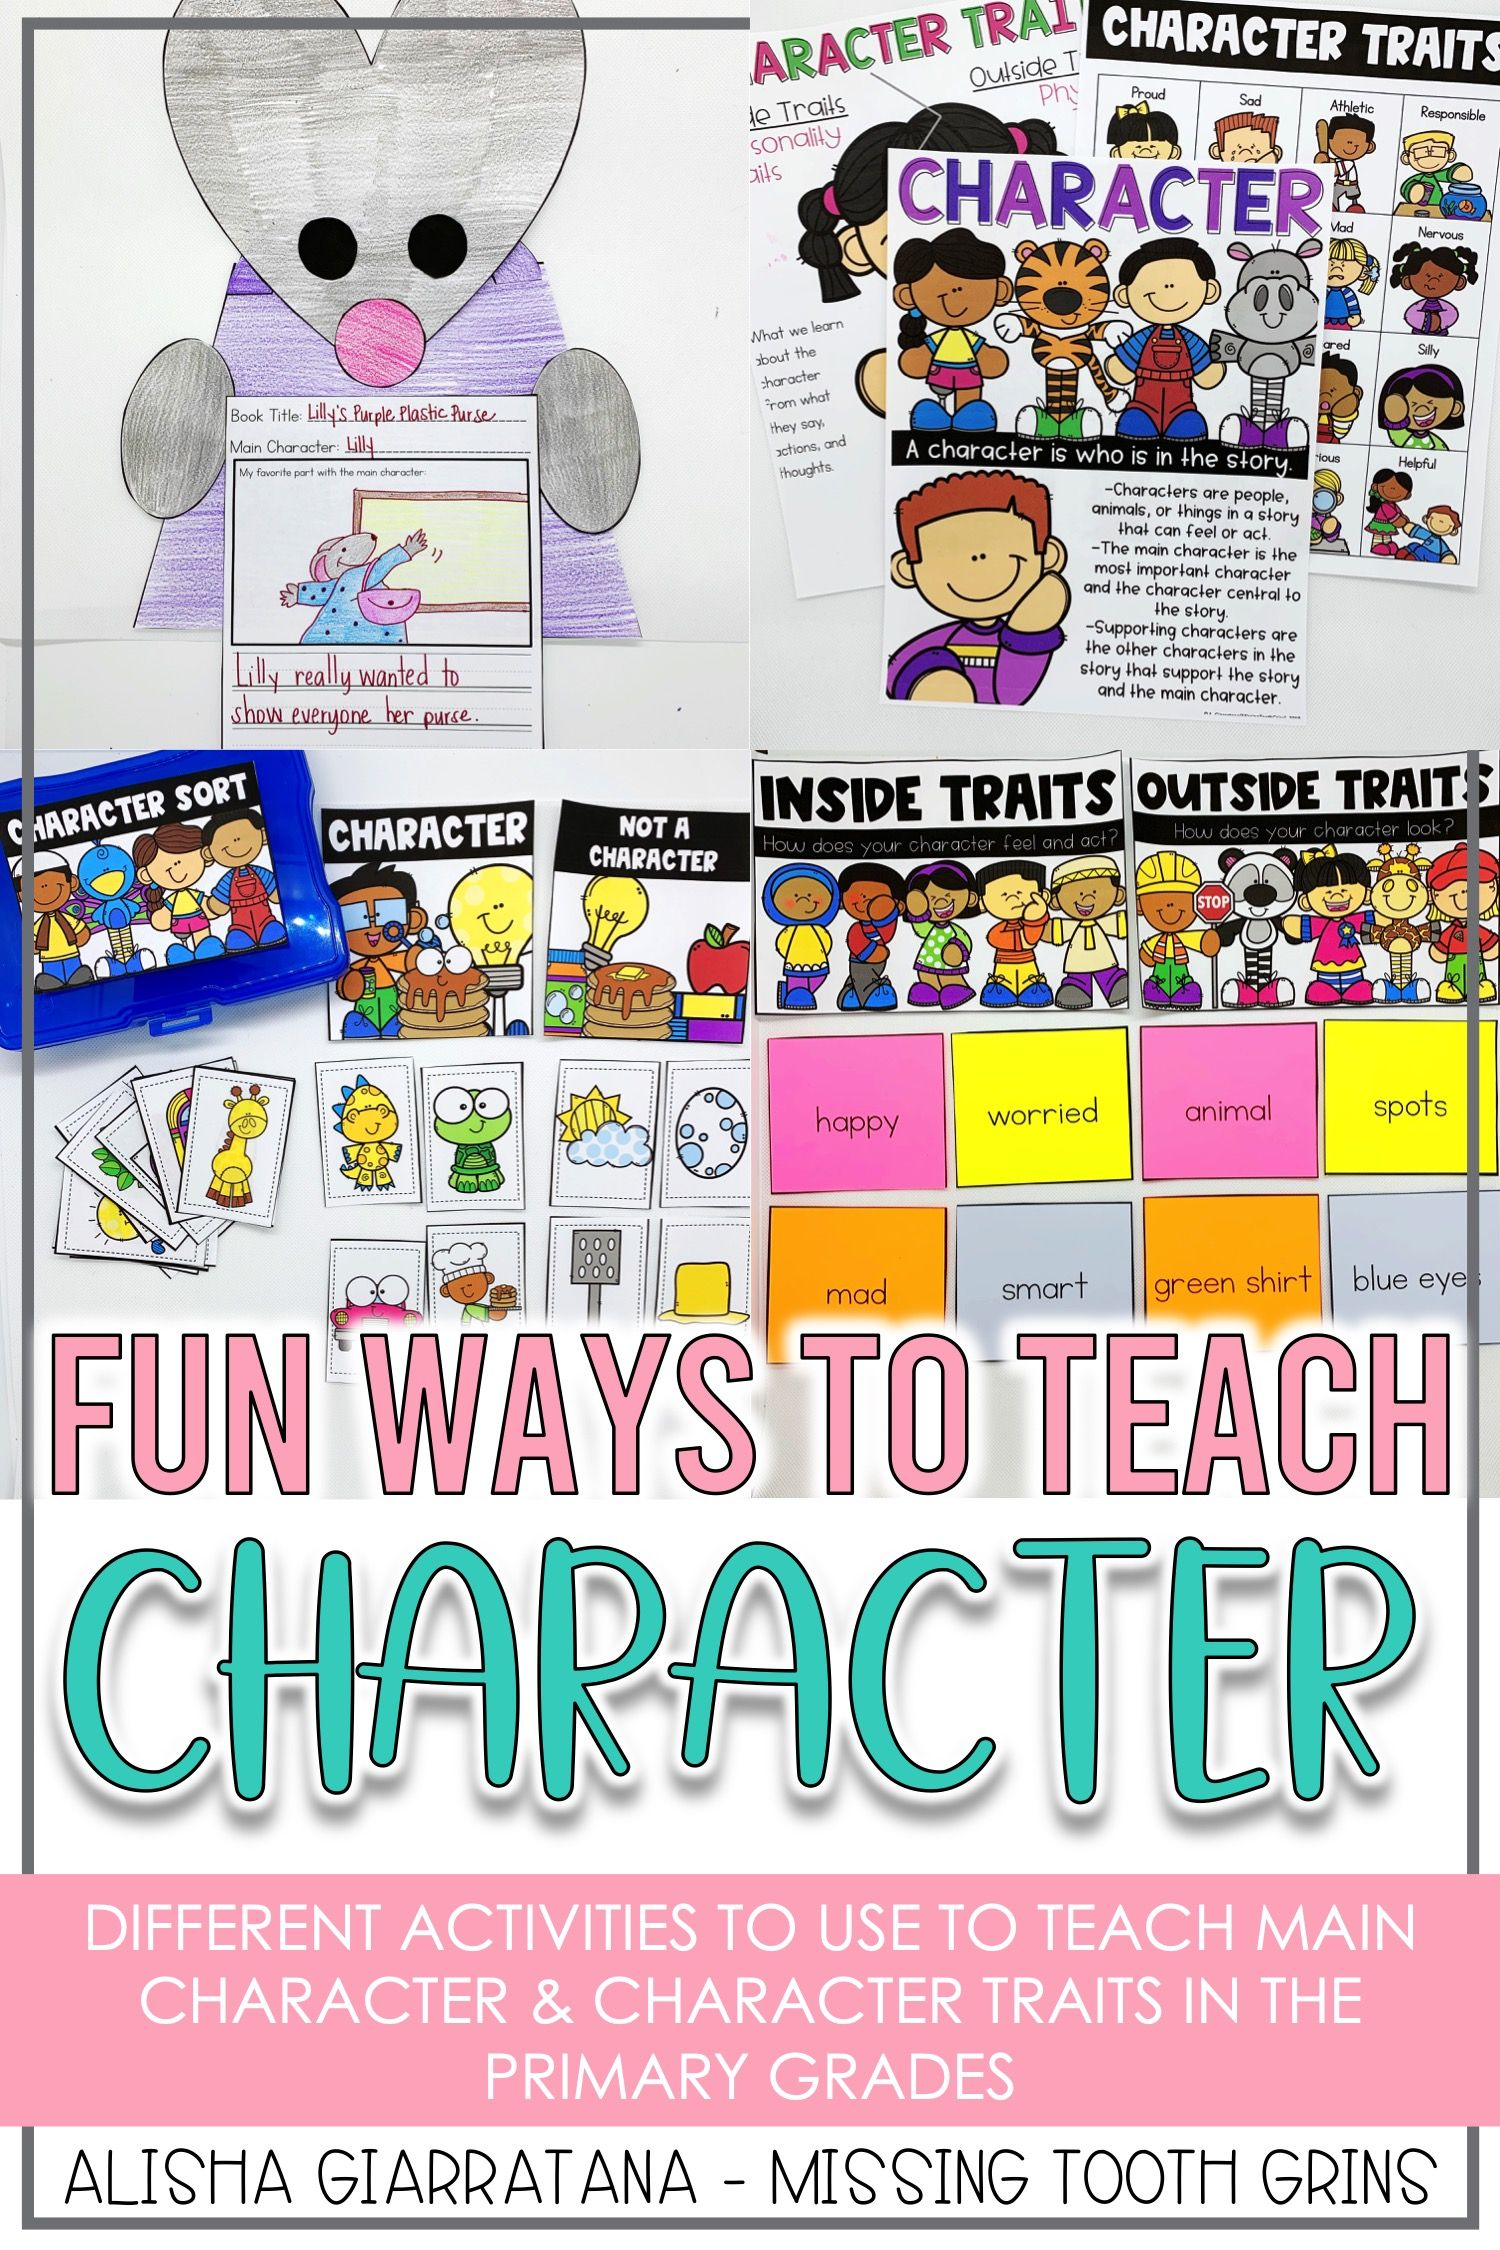 Teaching Main Character And Character Traits